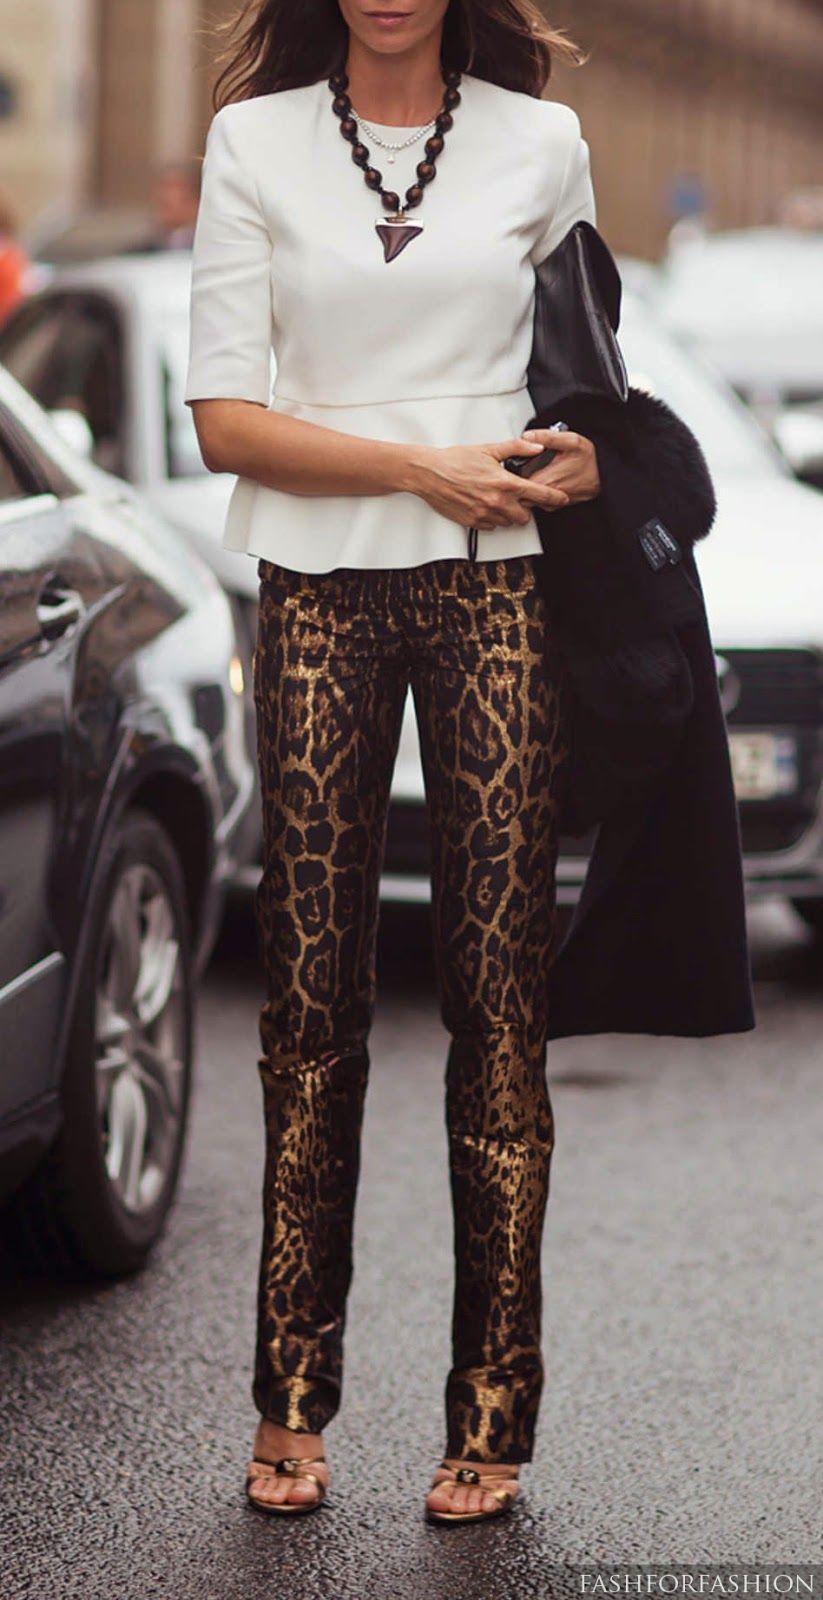 Find more leopard print inspo at www.fashionaddict.com.au xox